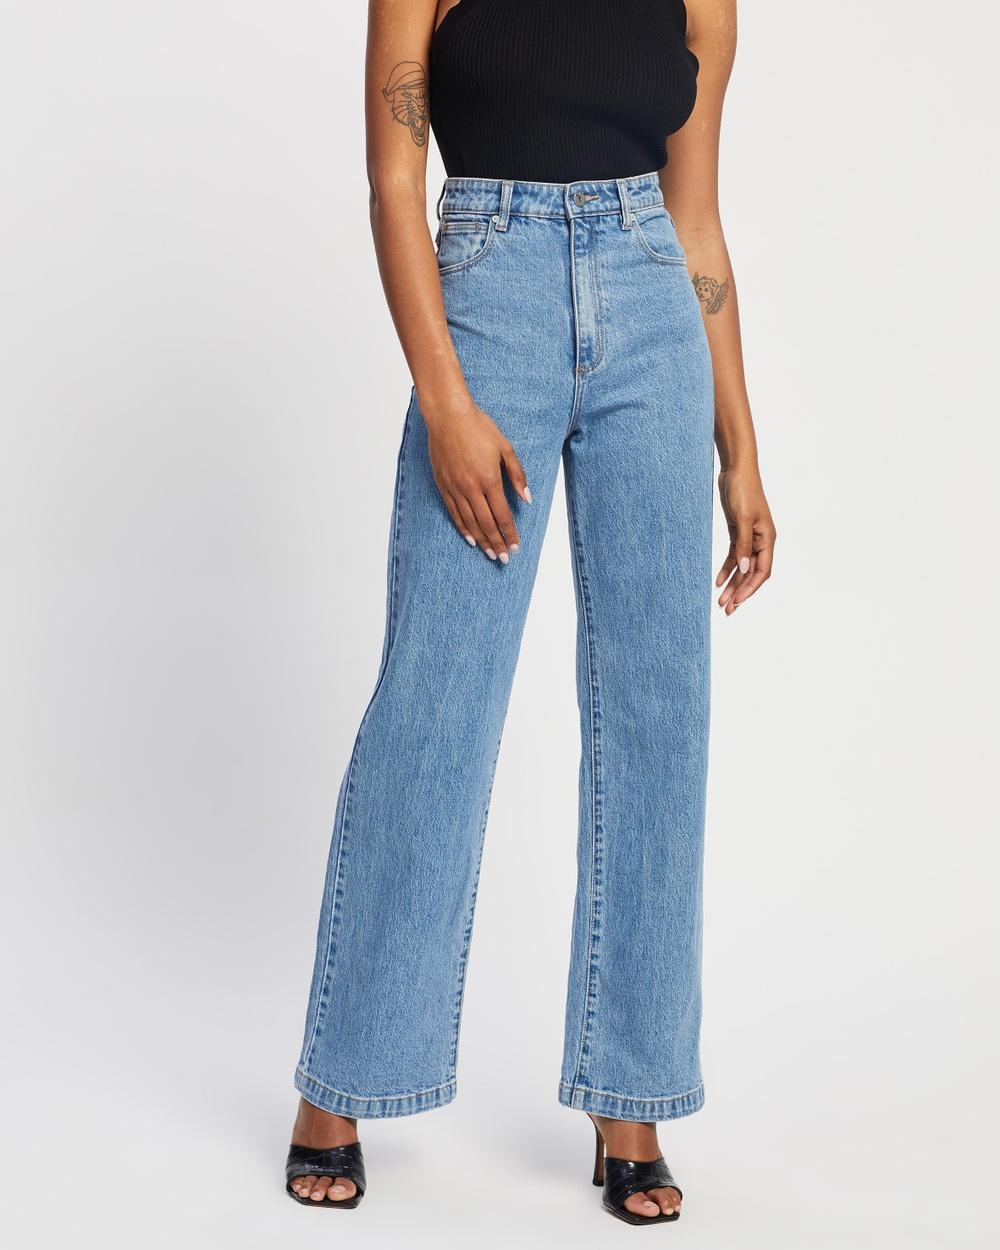 Abrand A '94 High Wide Jeans High-Waisted Debbie